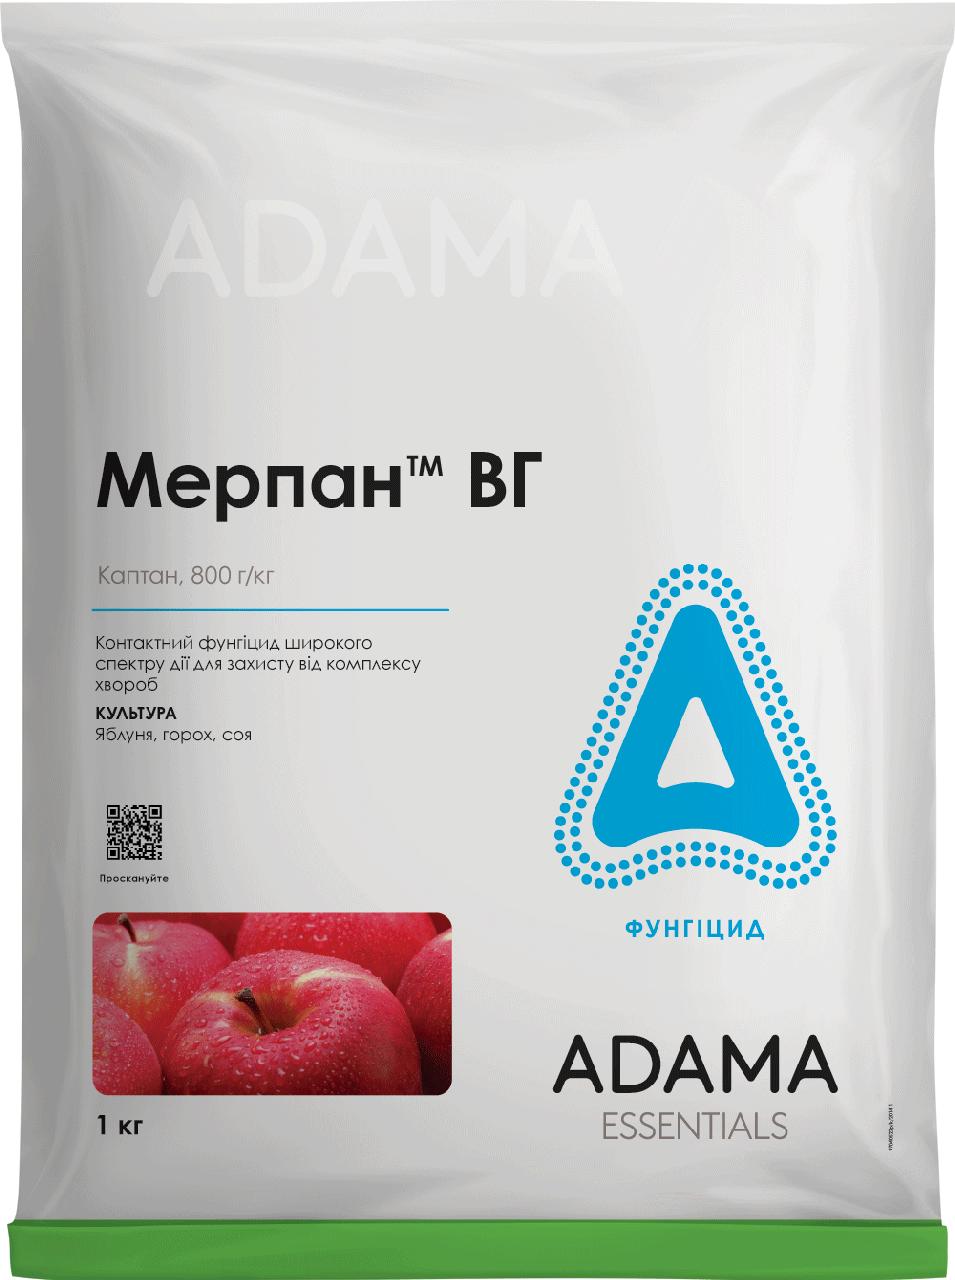 Фунгицид, Адама, МерпанТМ, Adama